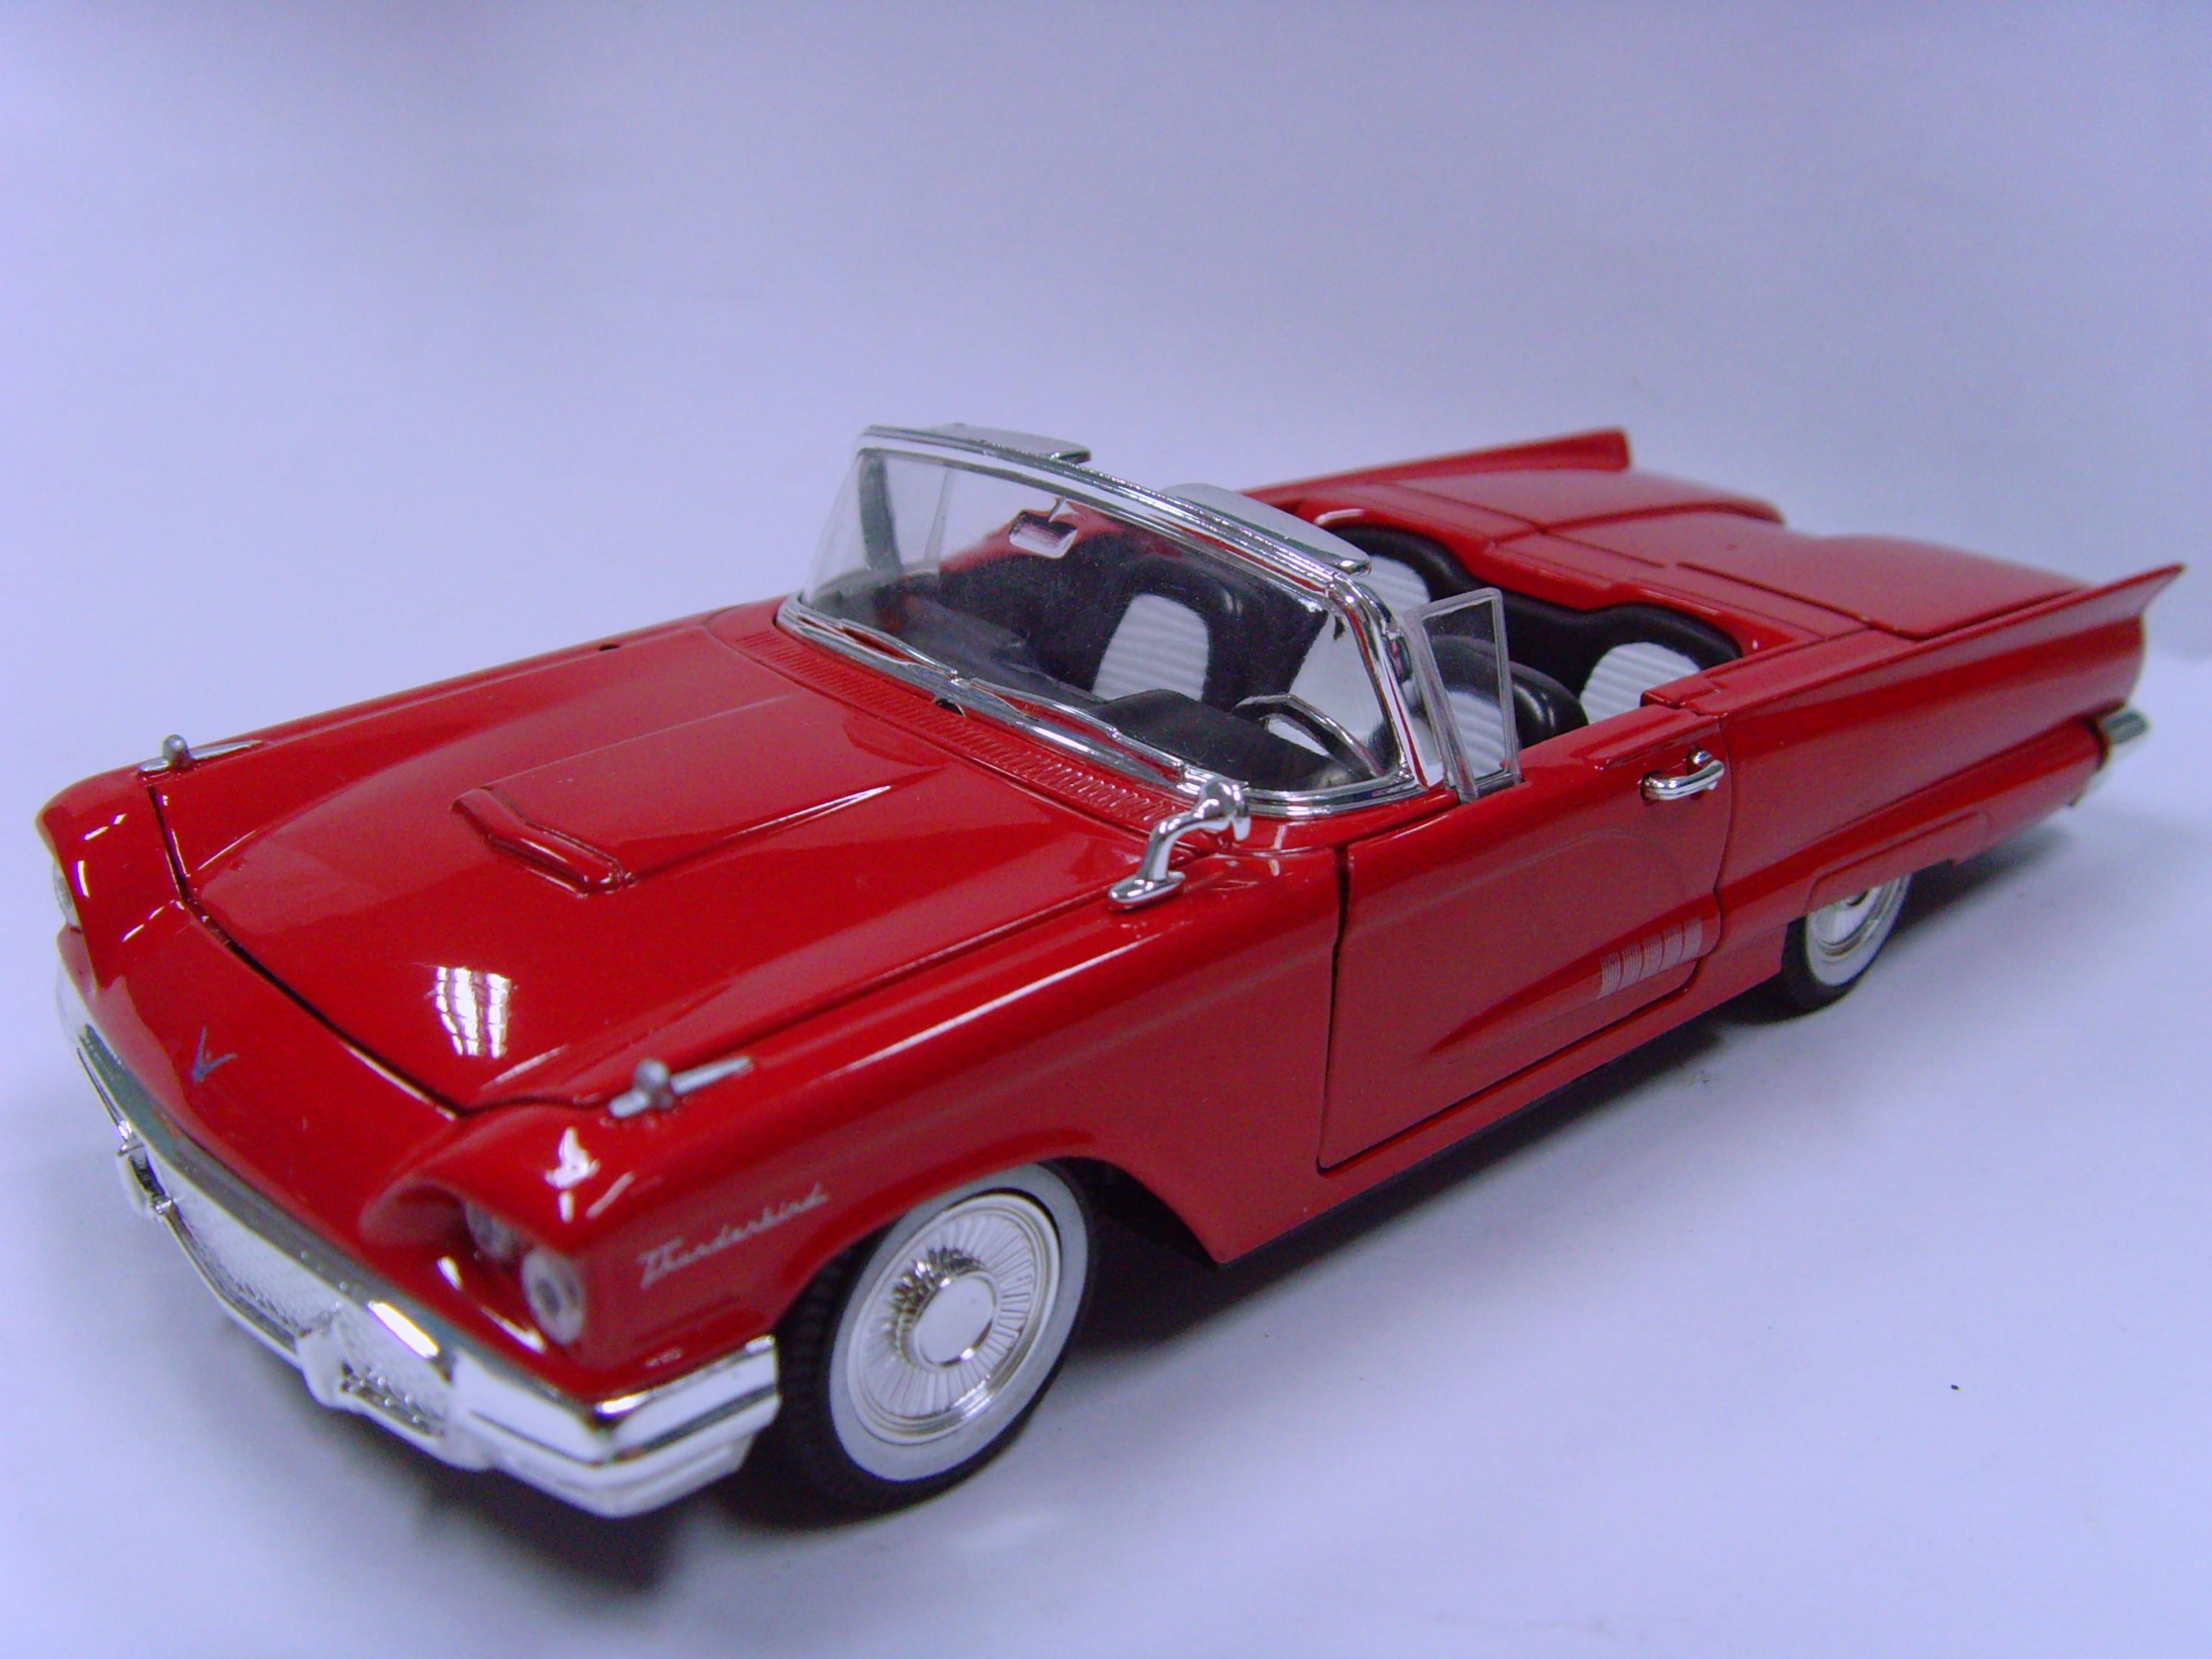 & 1958 Ford Thunderbird Convertible   Model Cars   hobbyDB markmcfarlin.com